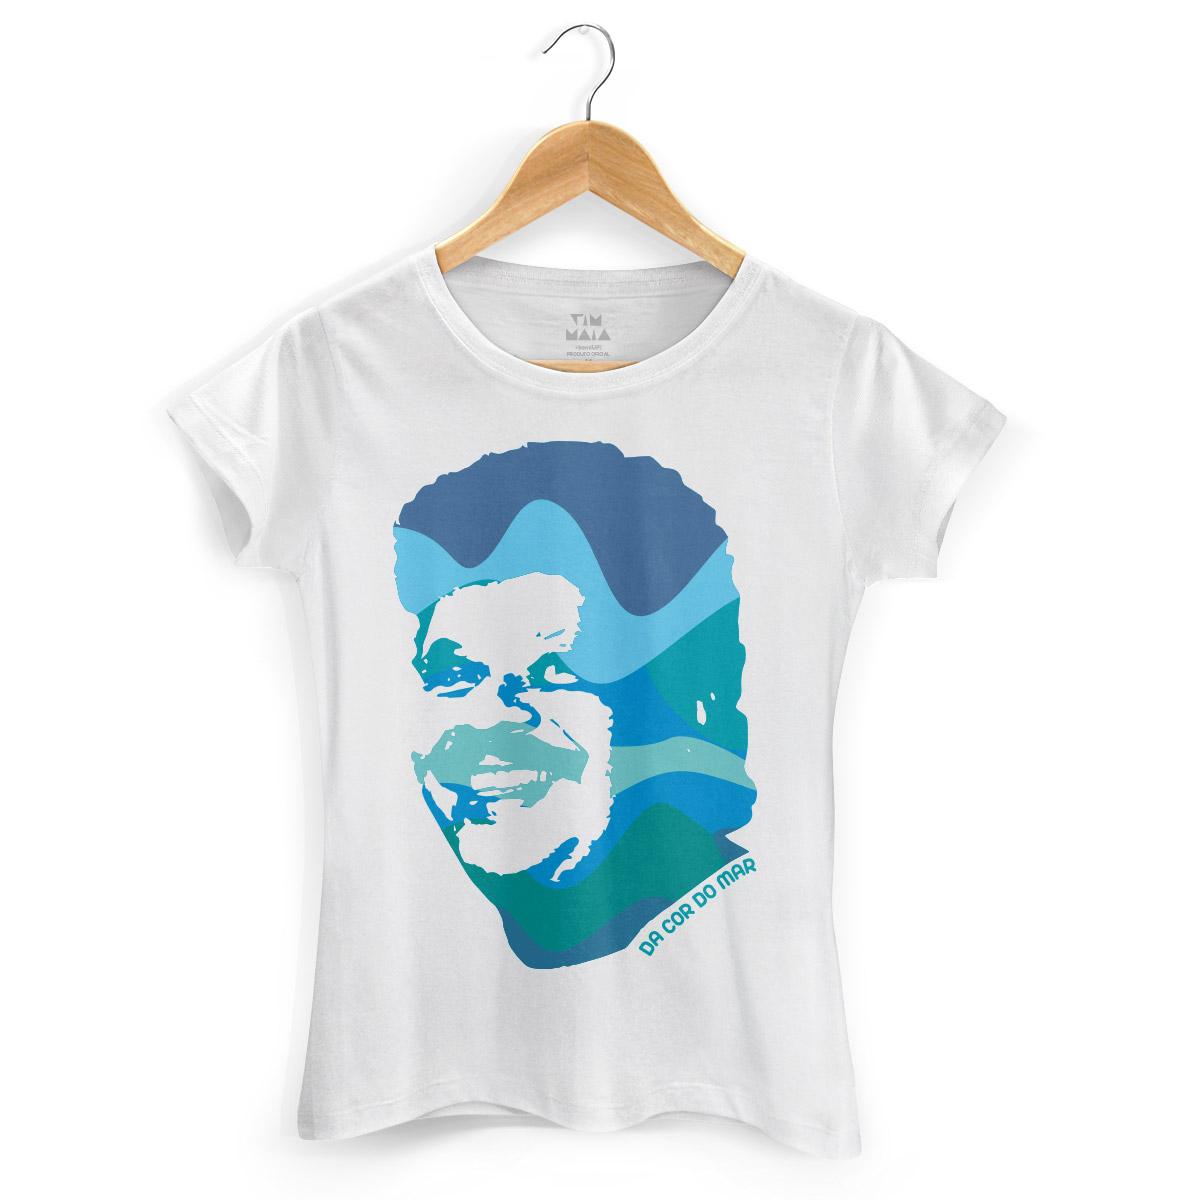 Camiseta Feminina Tim Maia Azul da Cor do Mar